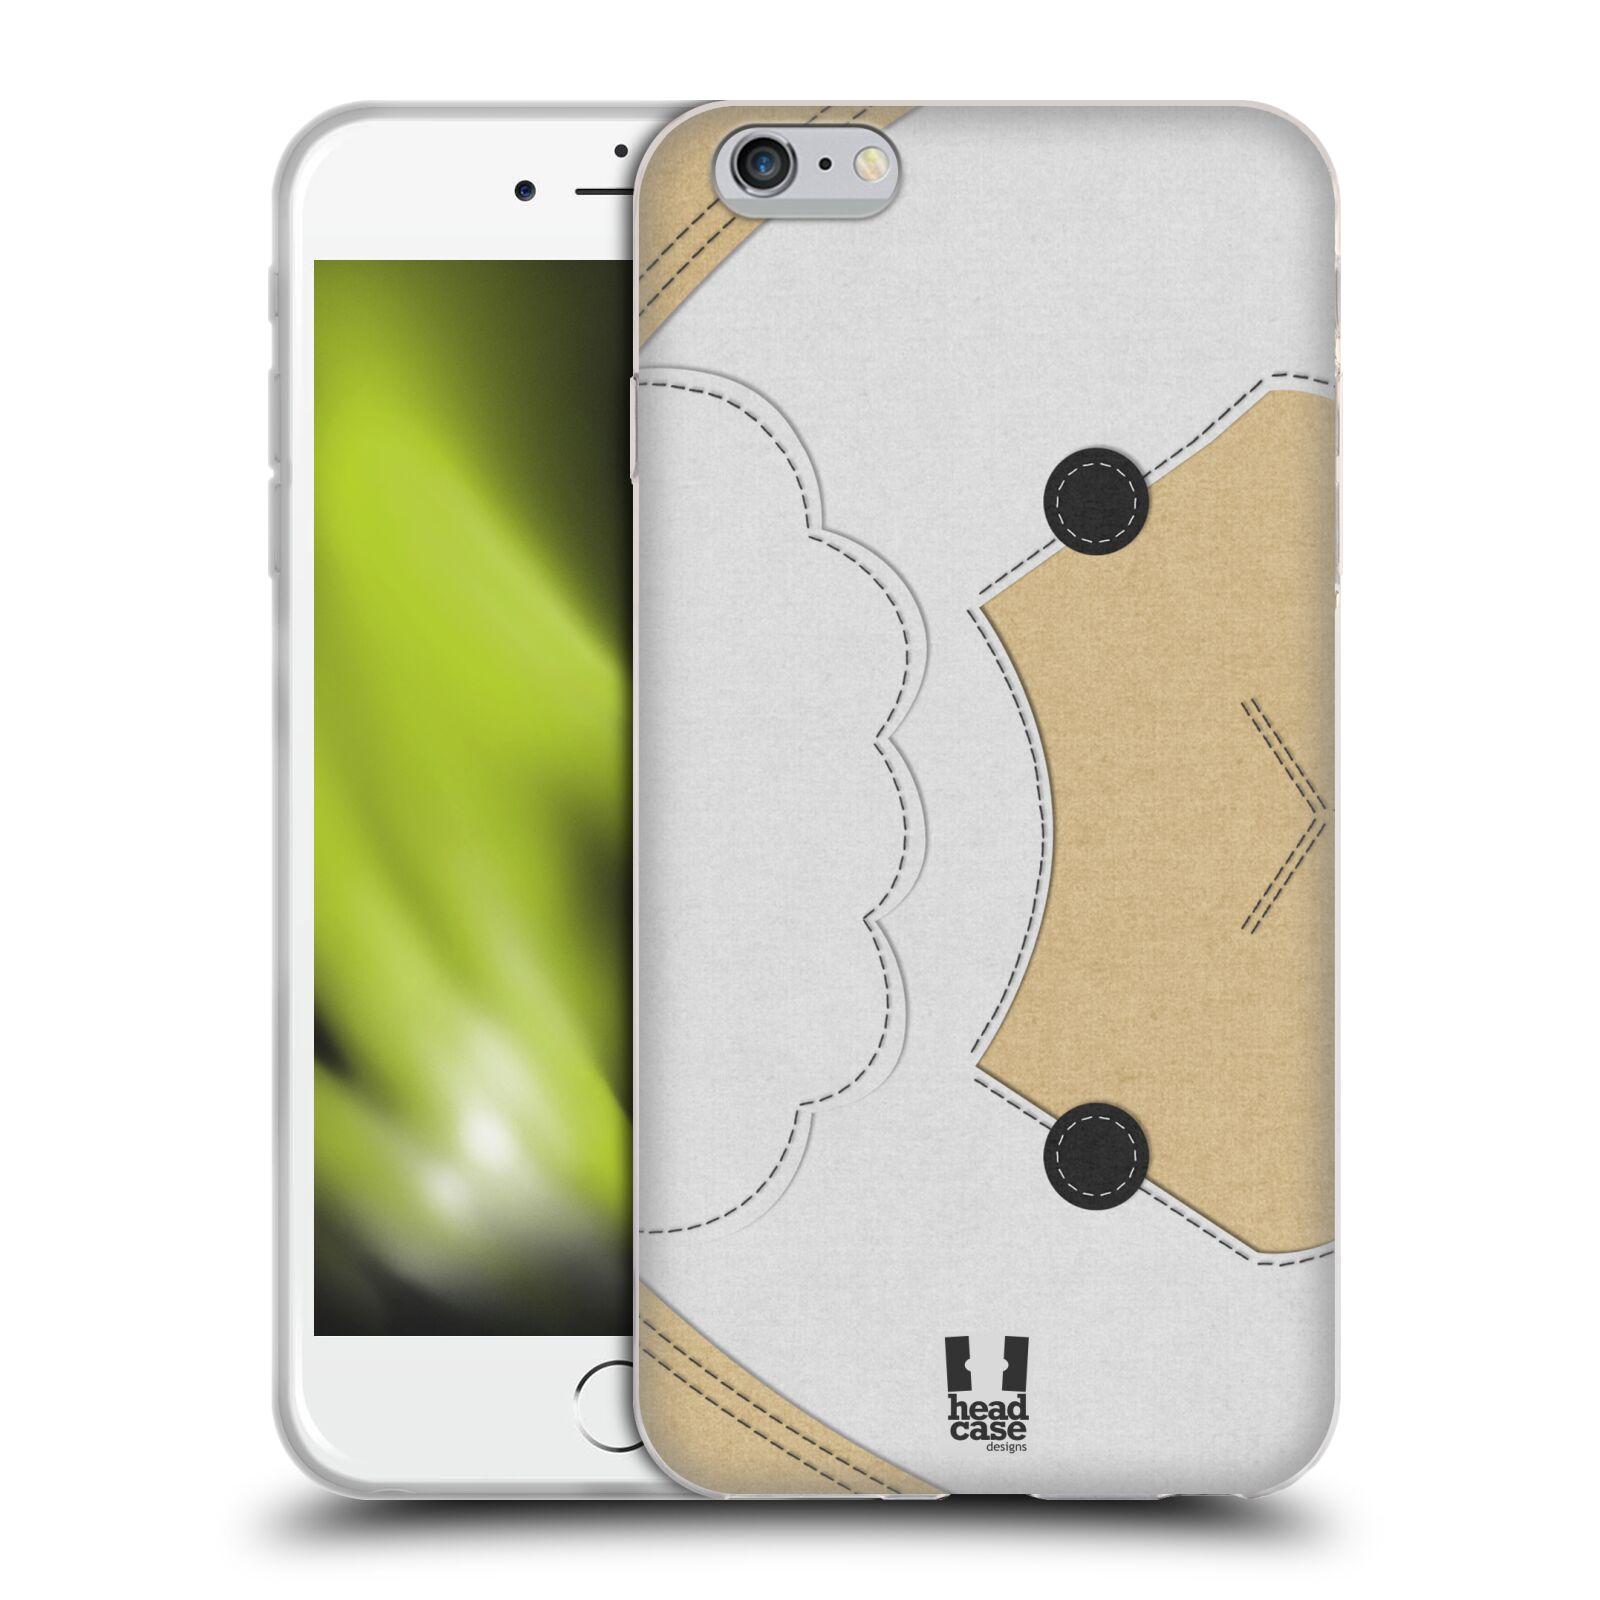 HEAD CASE silikonový obal na mobil Apple Iphone 6 PLUS/ 6S PLUS vzor zvířecí nášivka ovečka